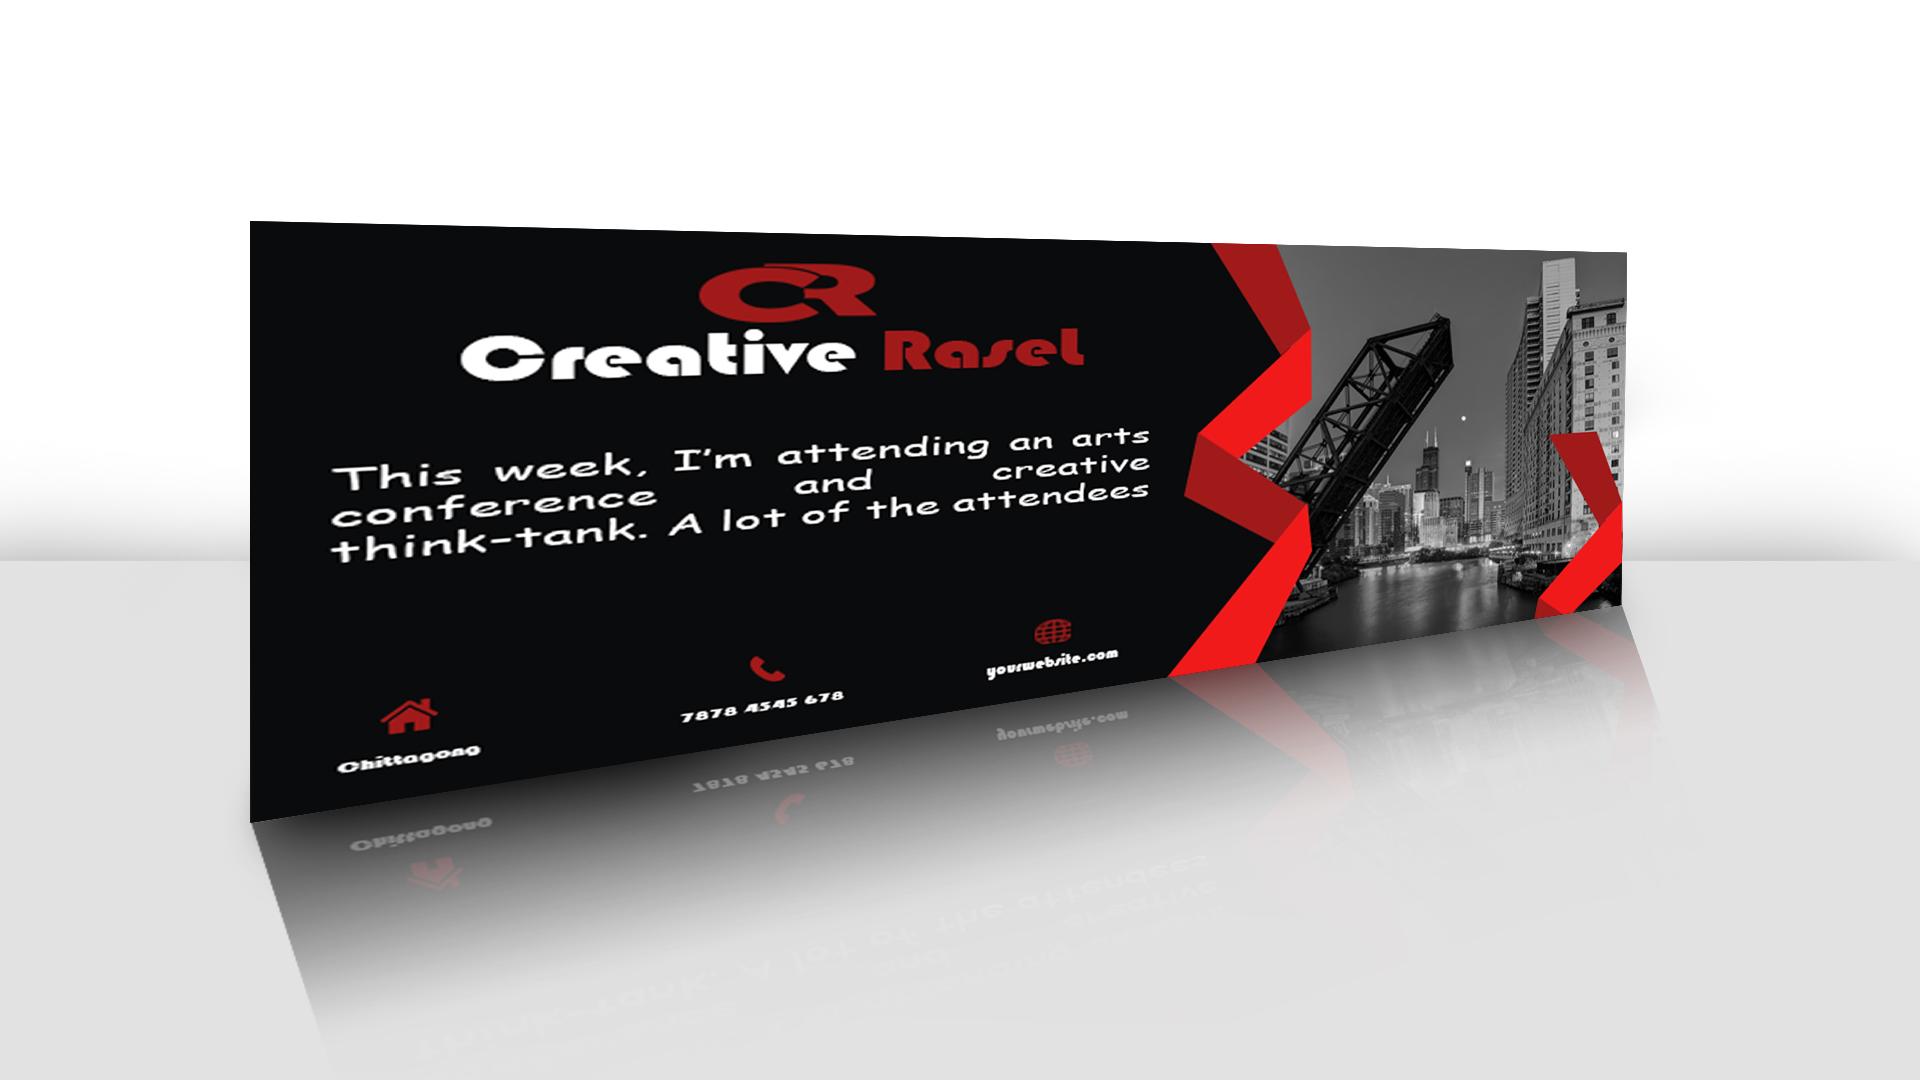 Design A Professional Facebook Cover,Banner Header, Ads